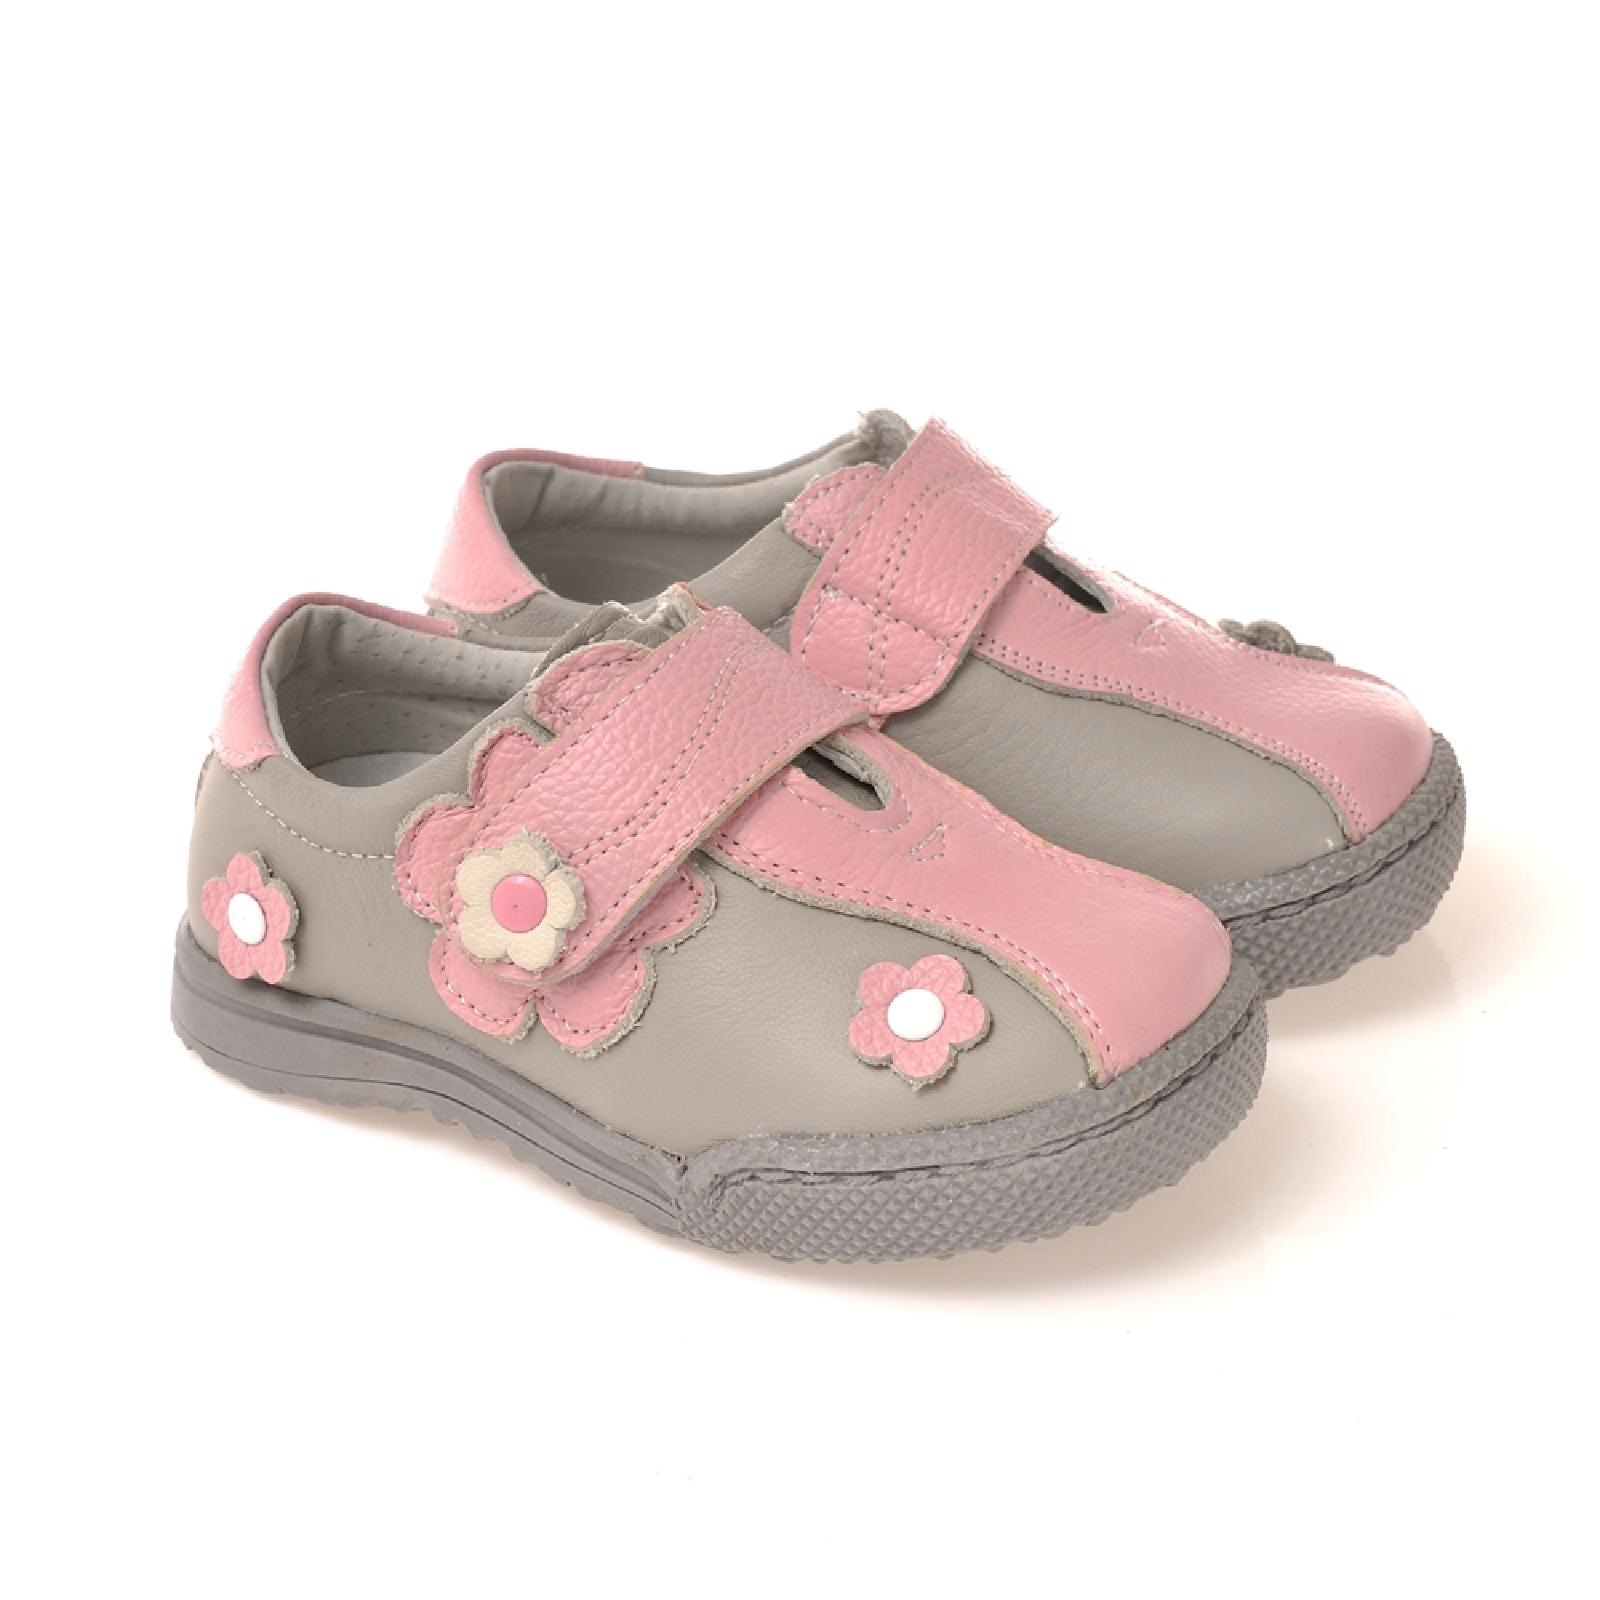 Indexbild 12 - Caroch Mädchen Sneaker Kinderschuhe Halbschuhe aus Leder